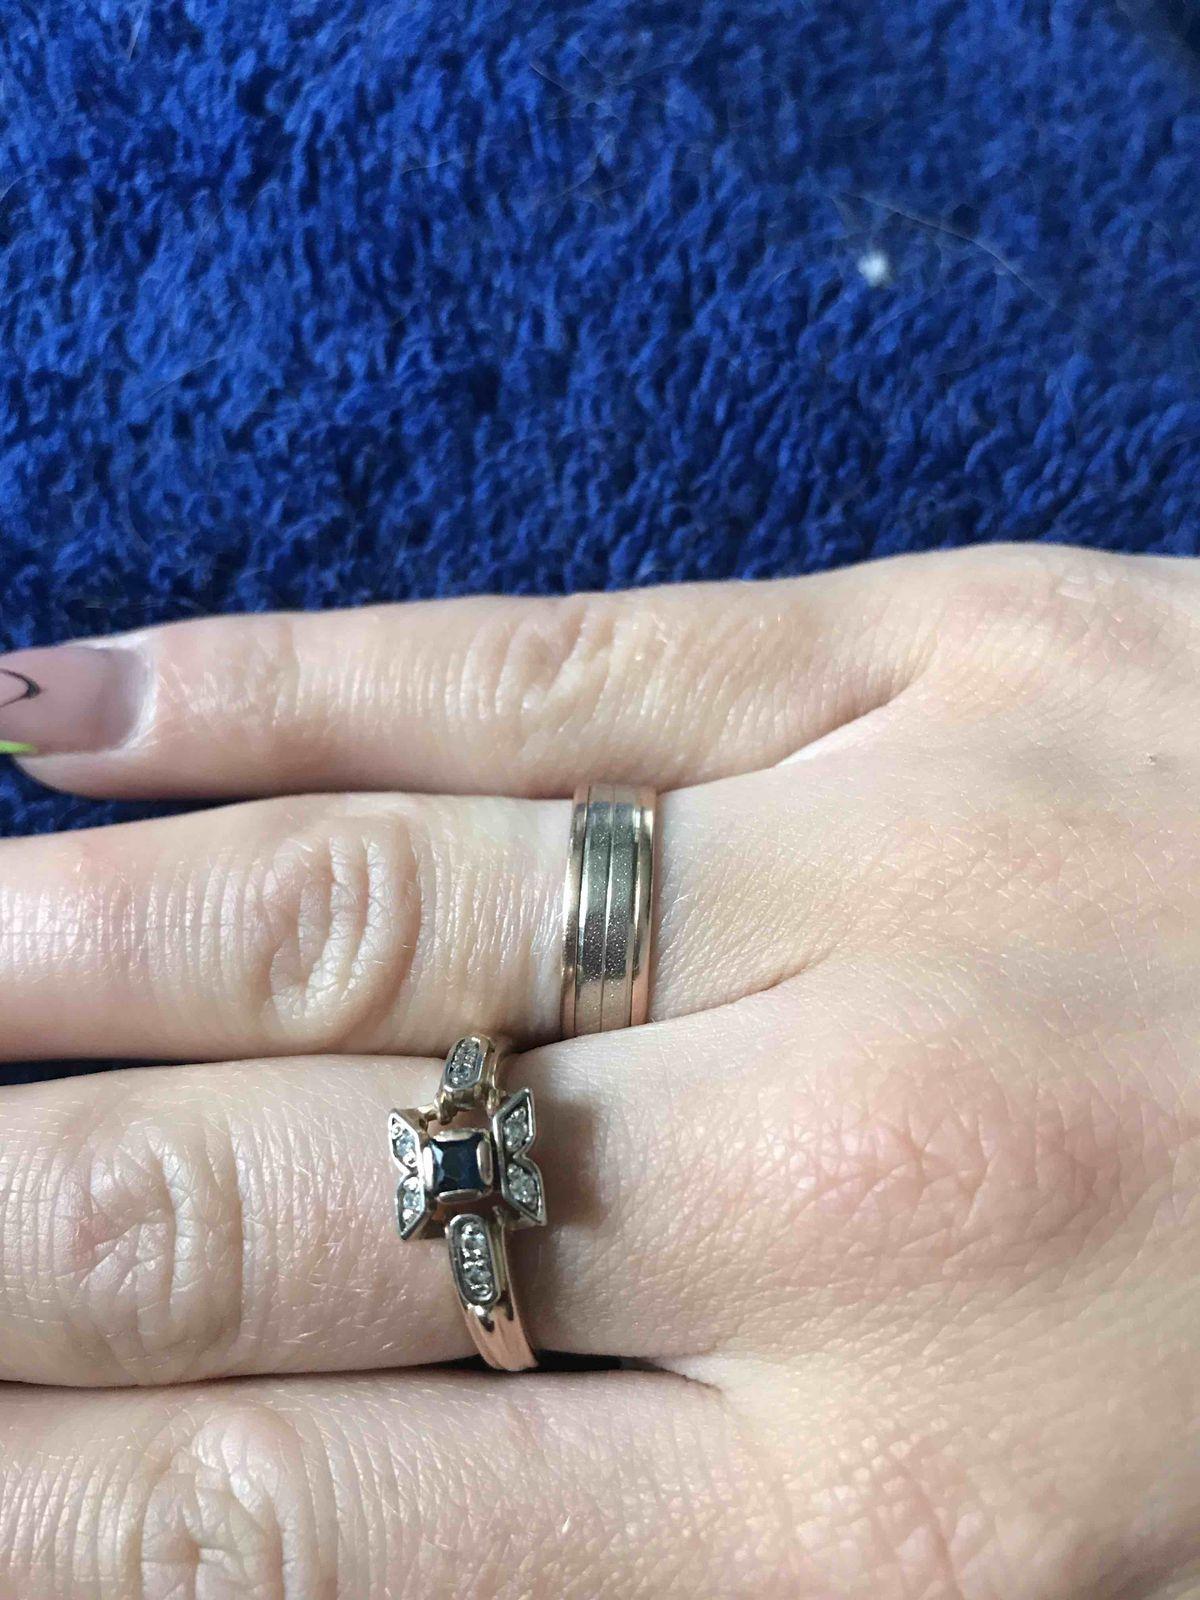 Супер носибельное кольцо